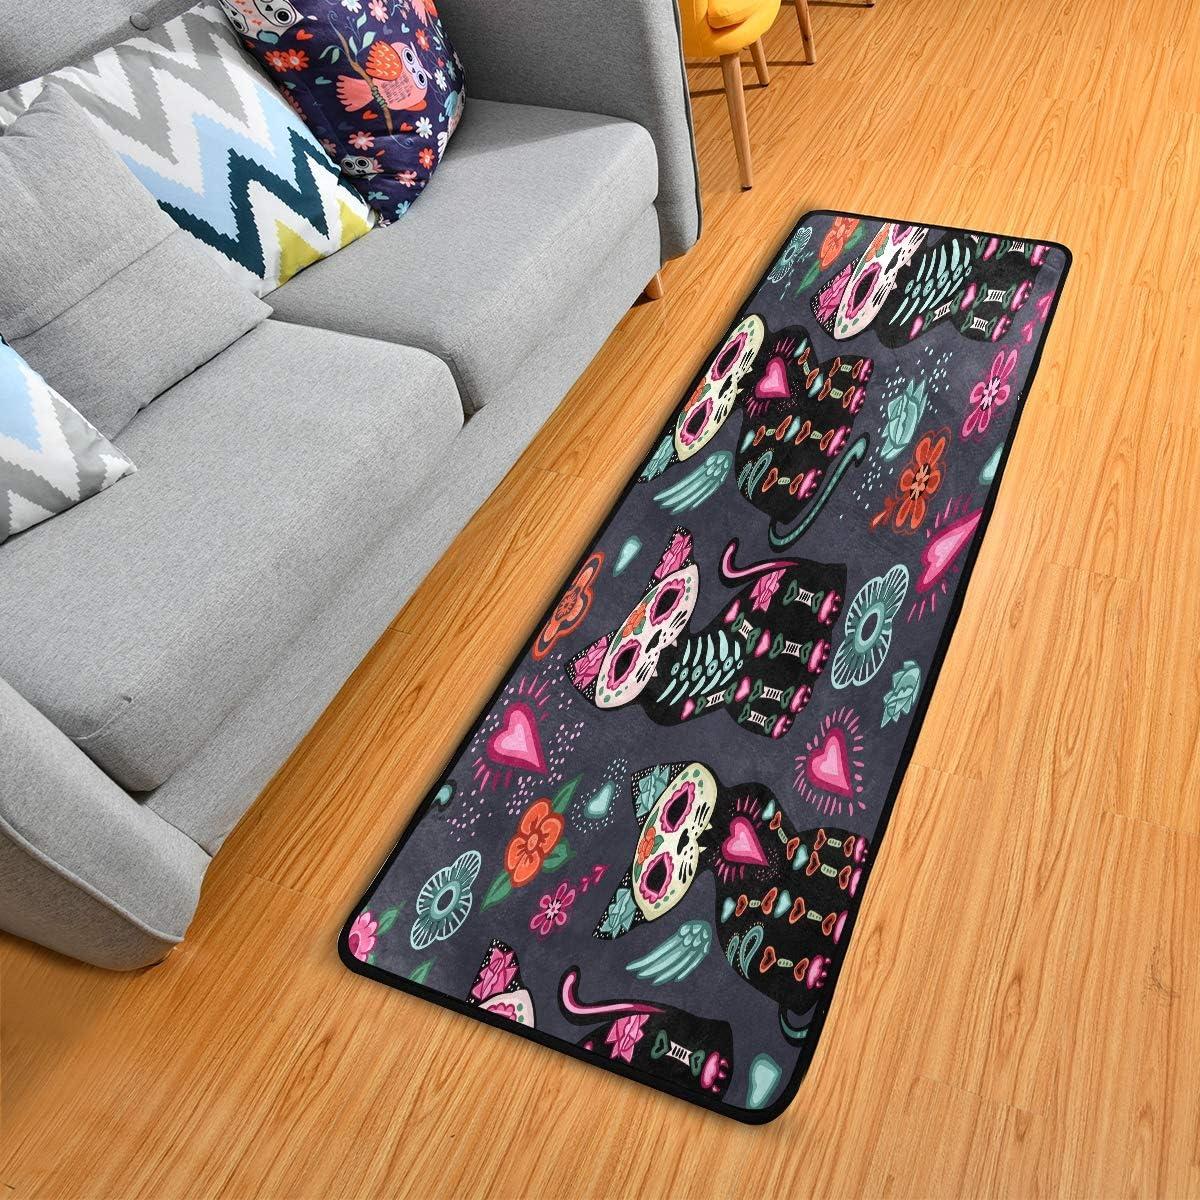 Floor Mat Sugar Skull Cat Flower Pattern,Non Slip Runner Rug for Hallway Entry Way Floor Carpet 2 x 6 , 72×24 inches